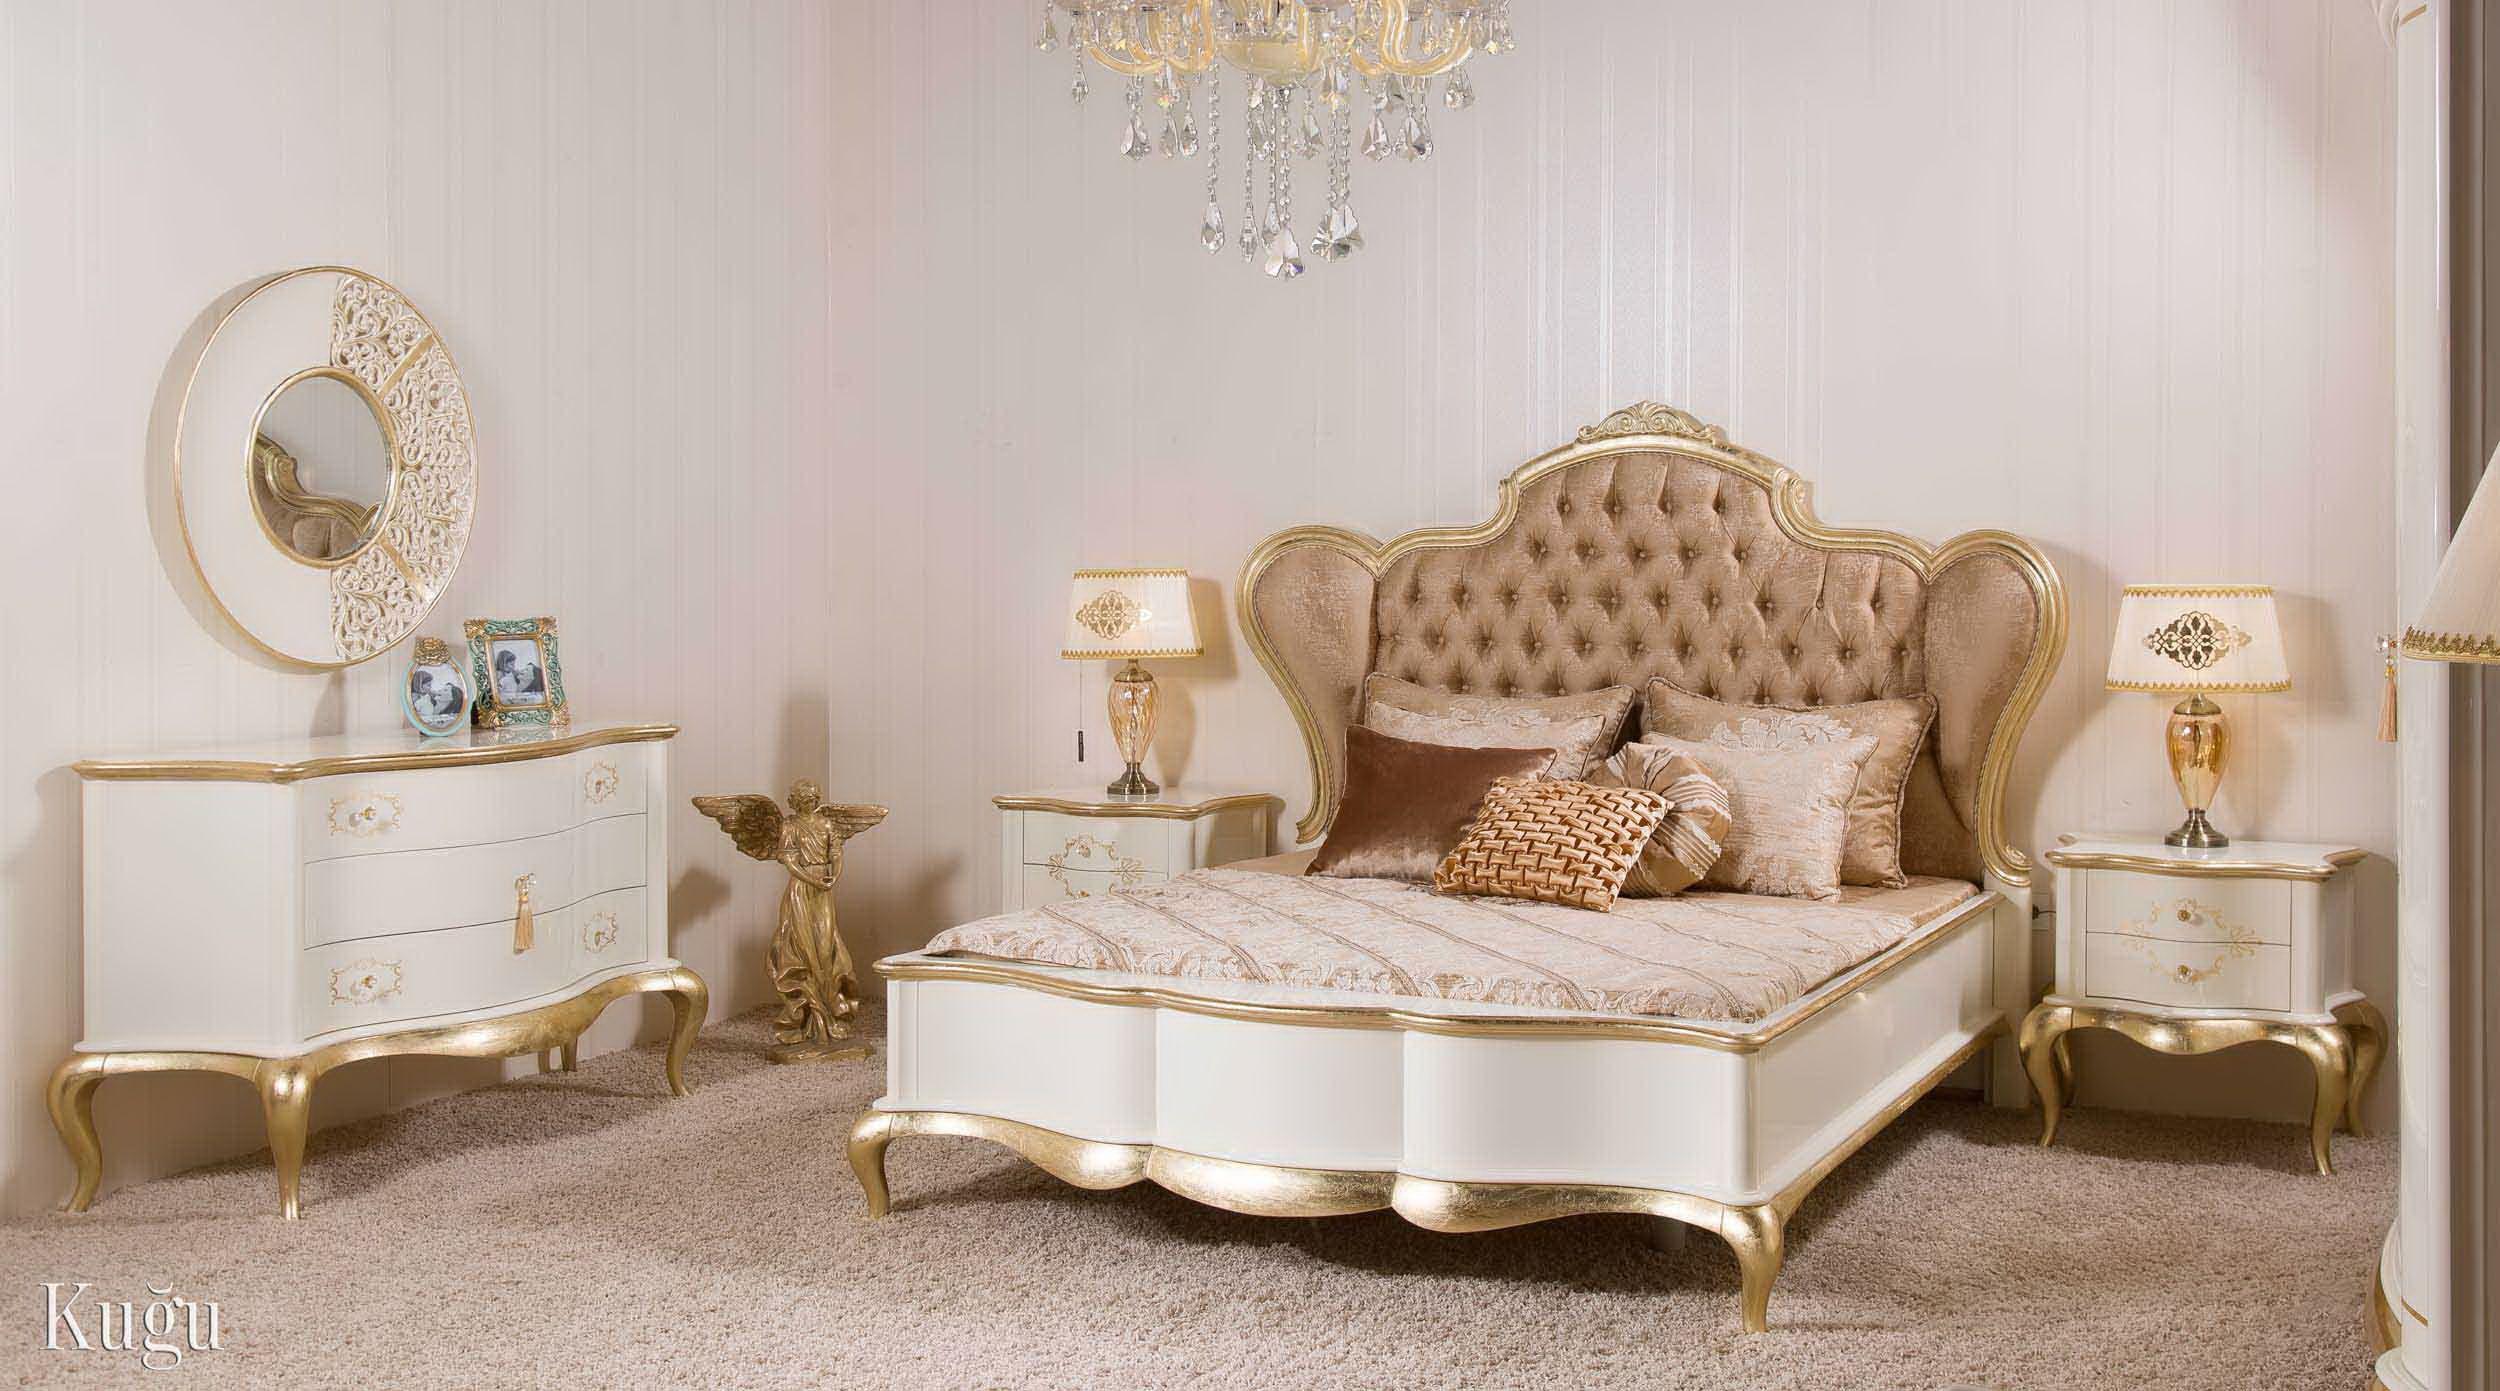 Luxuryfurniture In 2019 Sofa Furniture Chair Sofa Bed Furniture